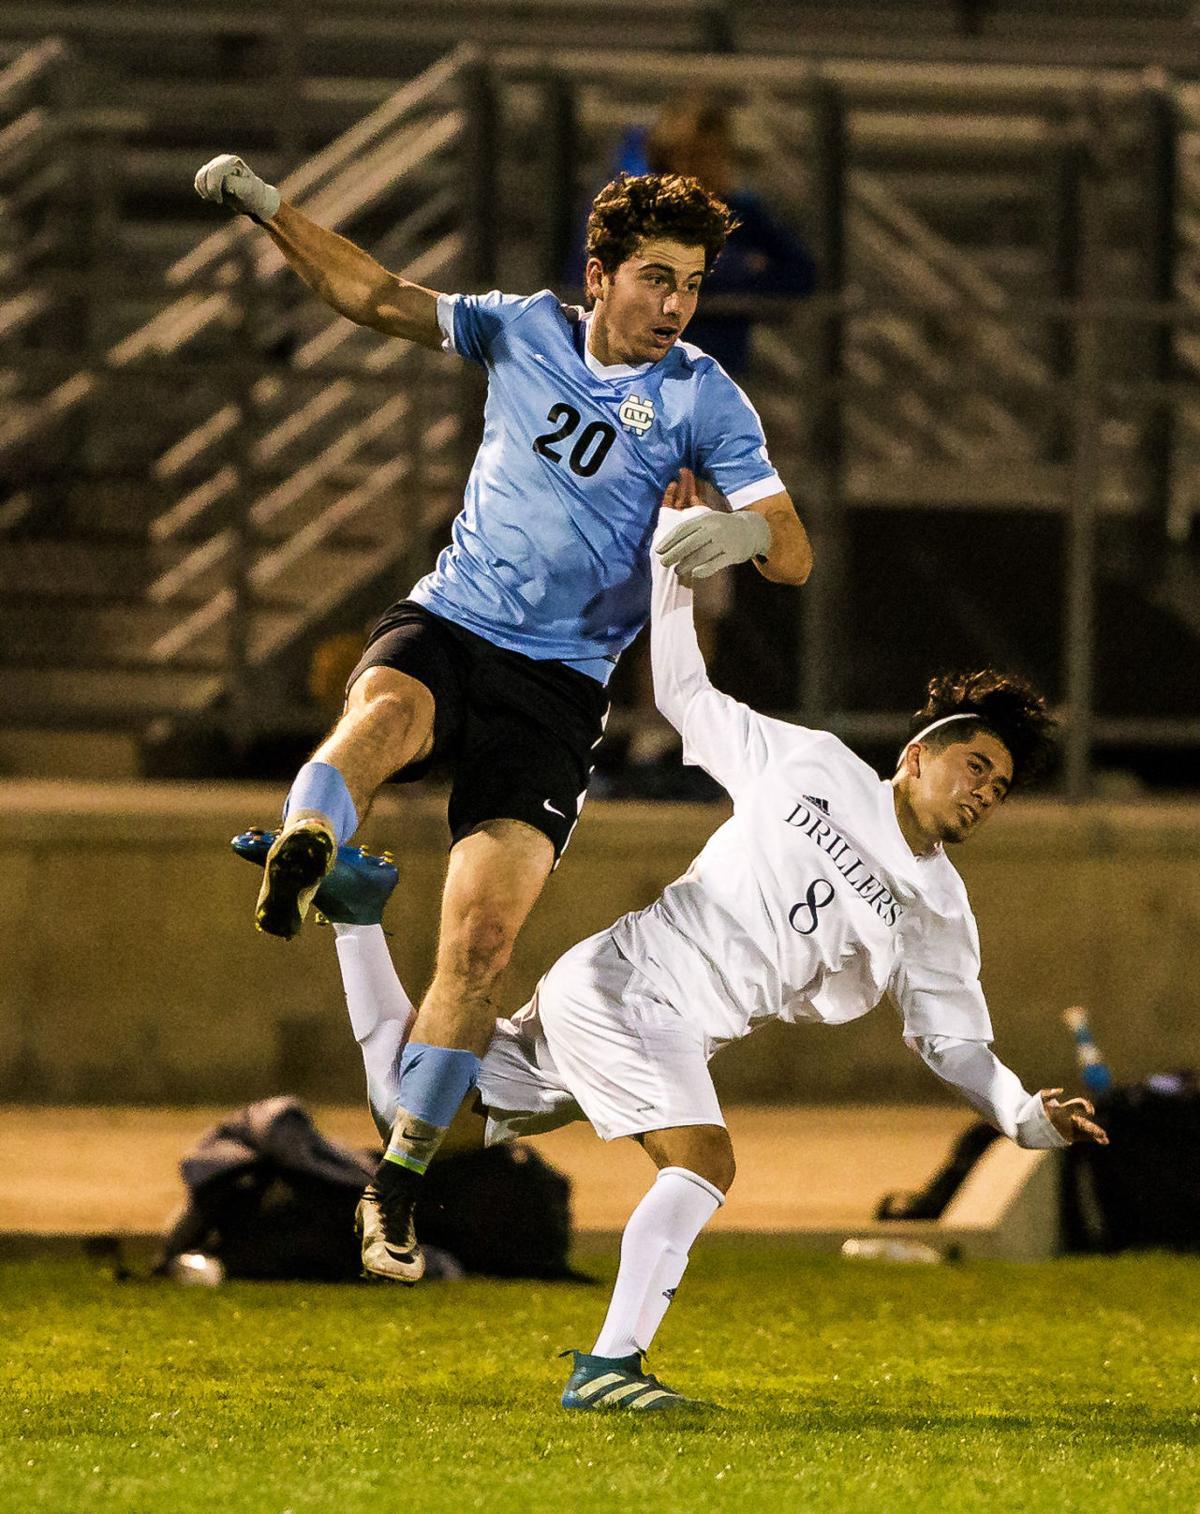 PHOTO GALLERY: BHS Soccer Vs. Clovis North